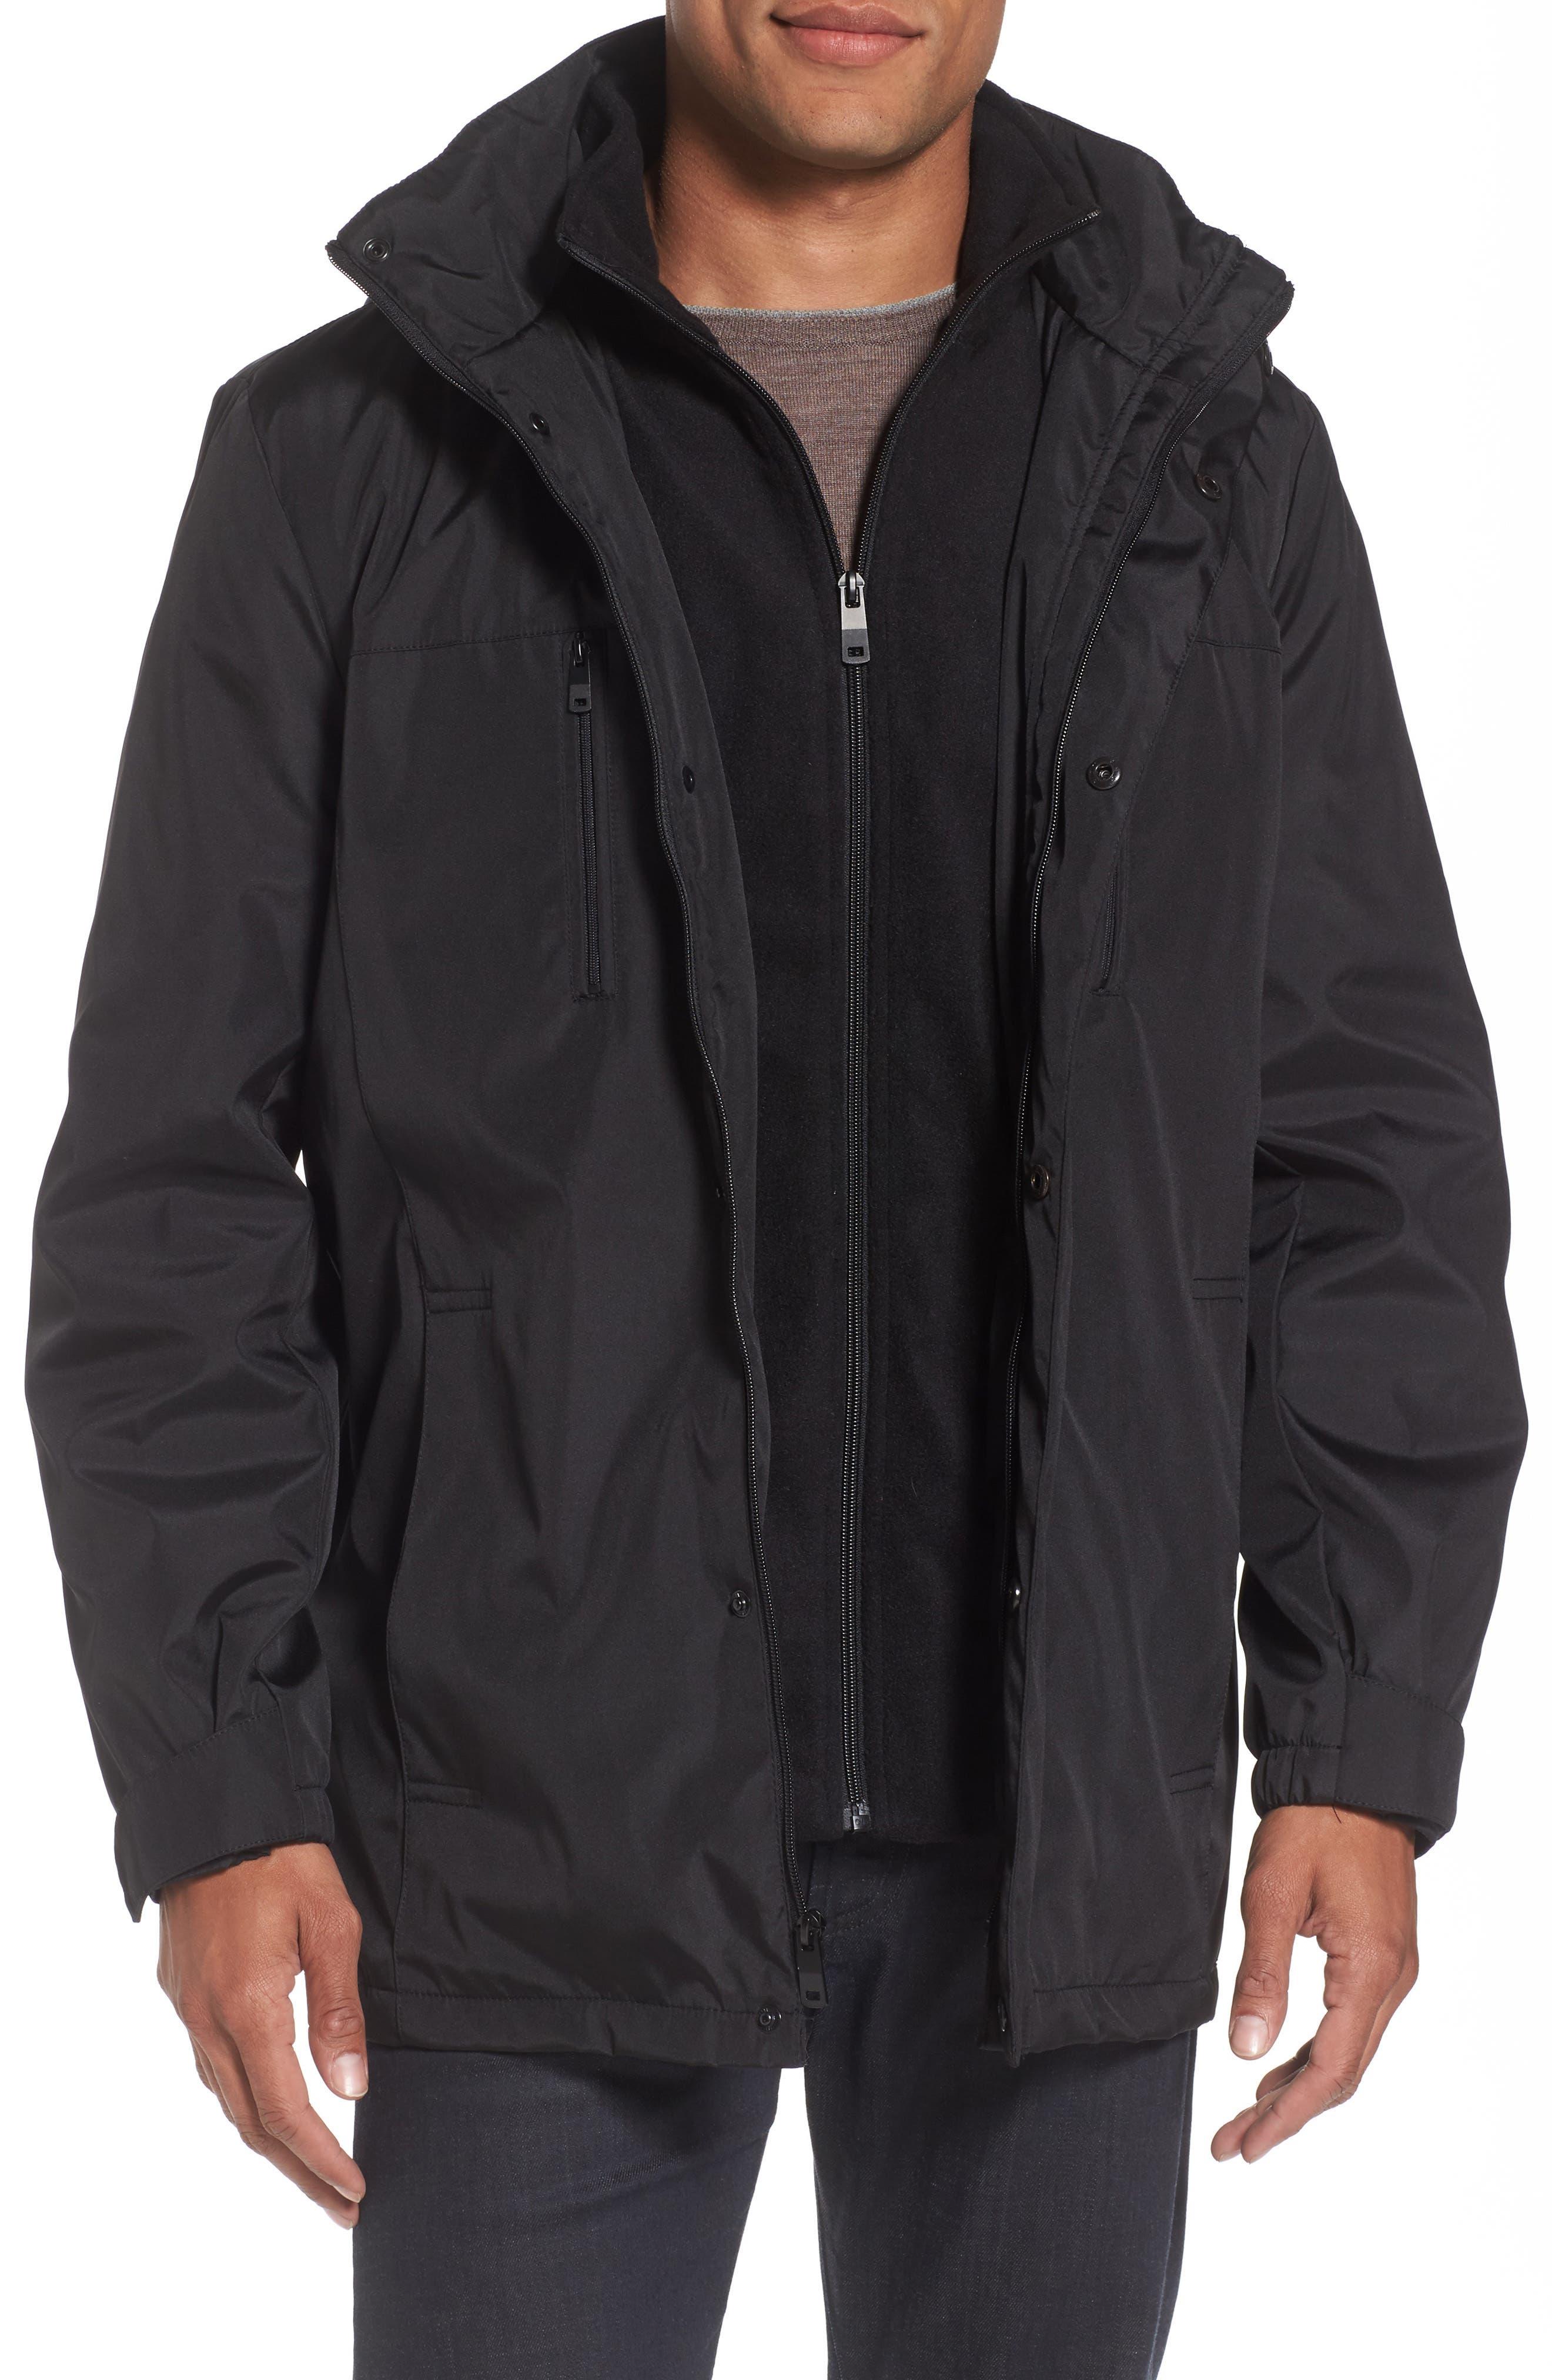 Hooded Jacket with Inset Fleece Bib,                             Main thumbnail 1, color,                             001